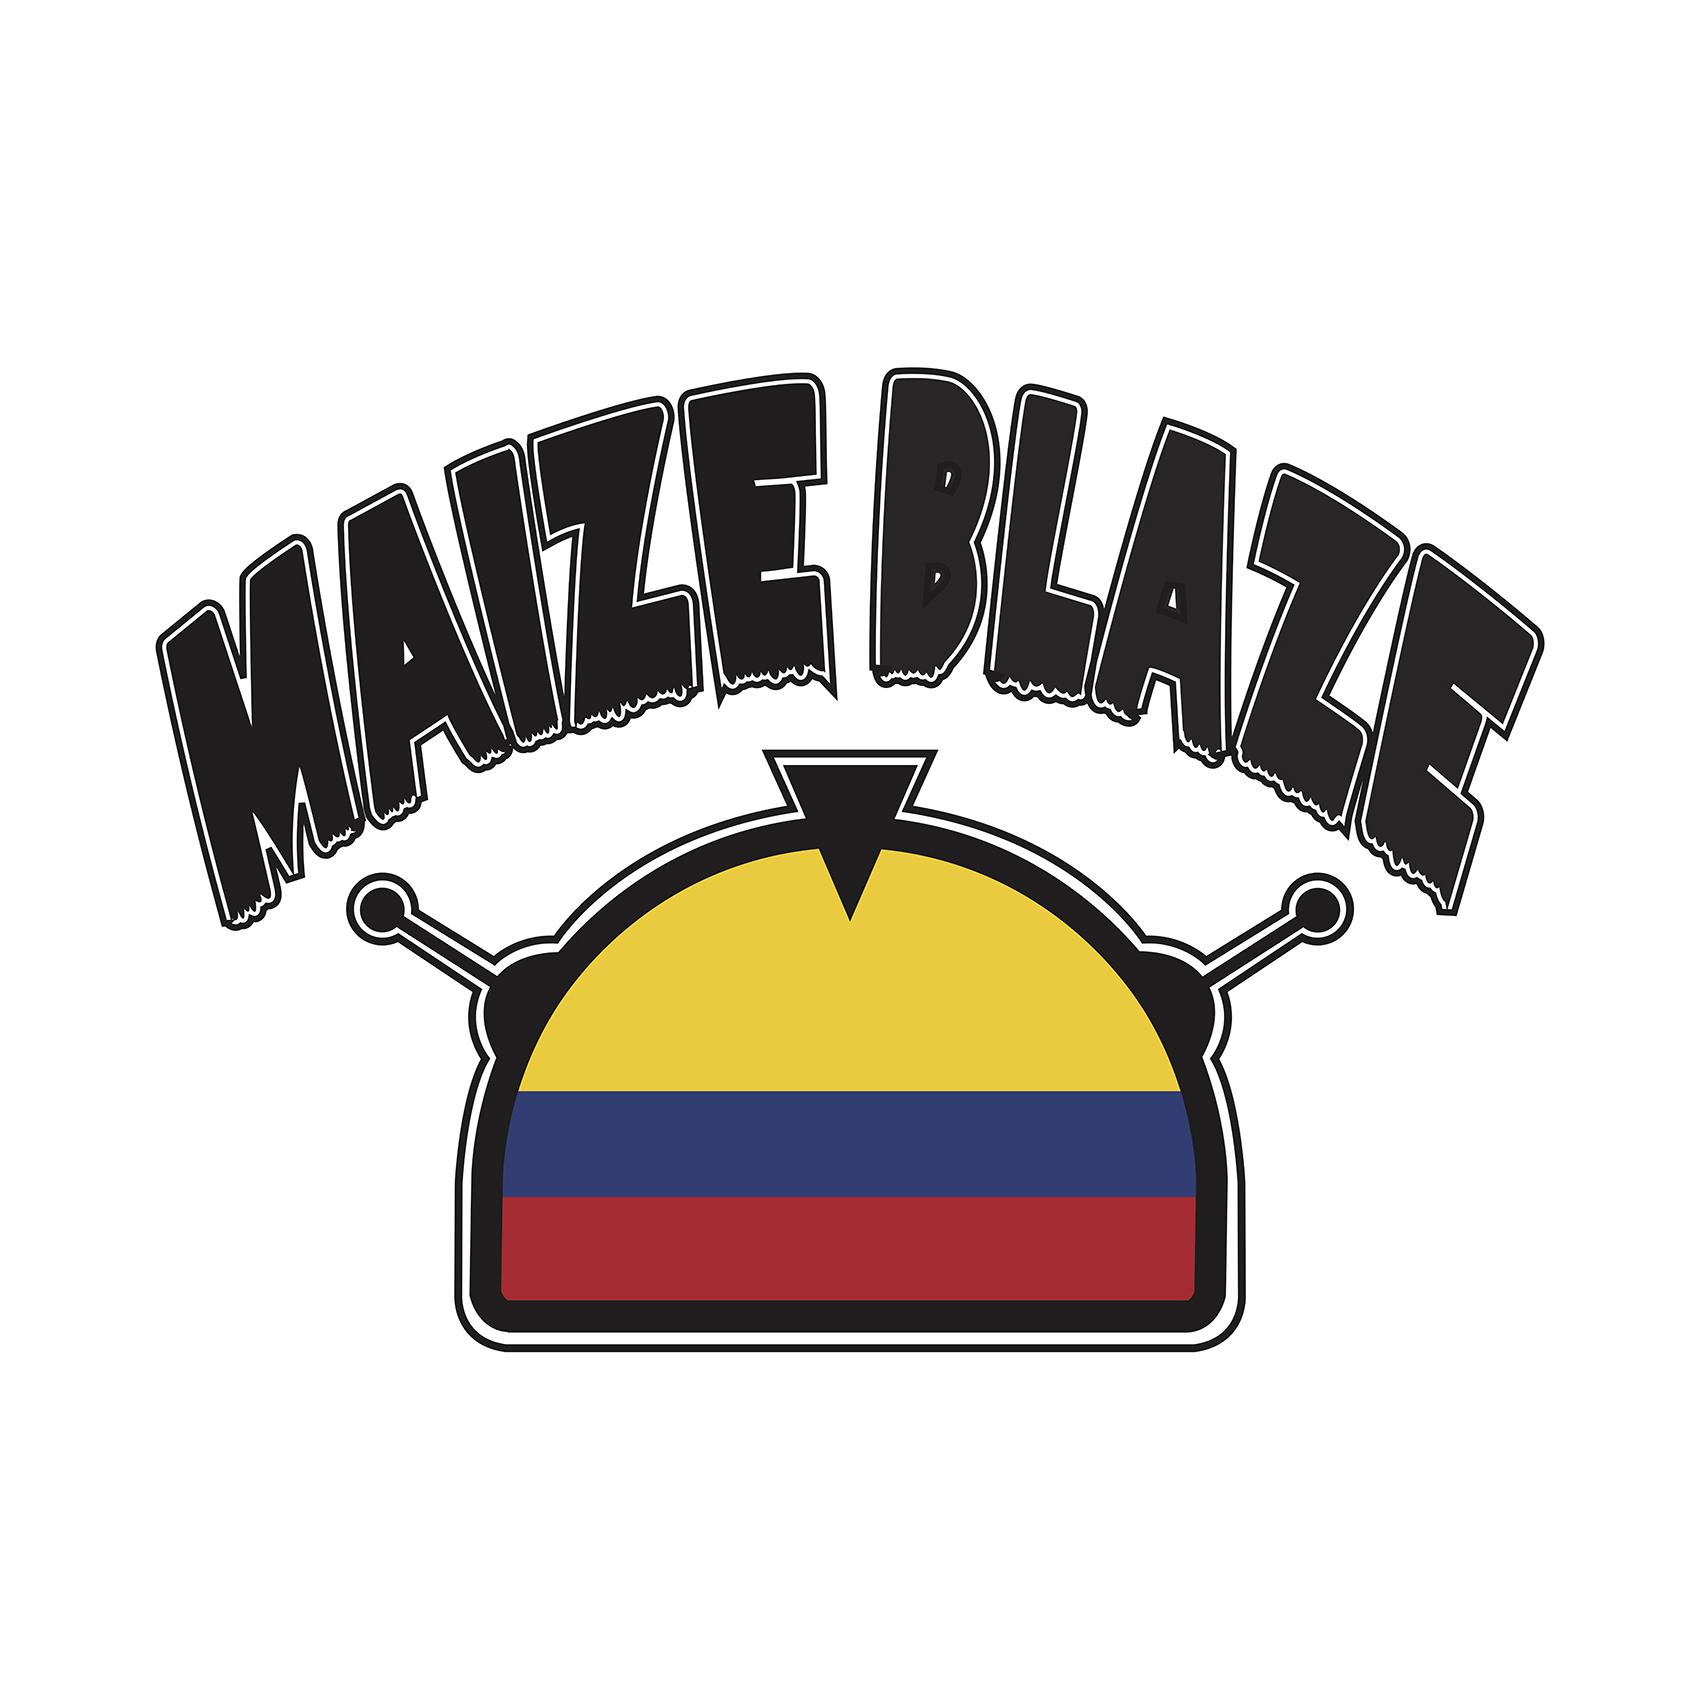 Maize Blaze